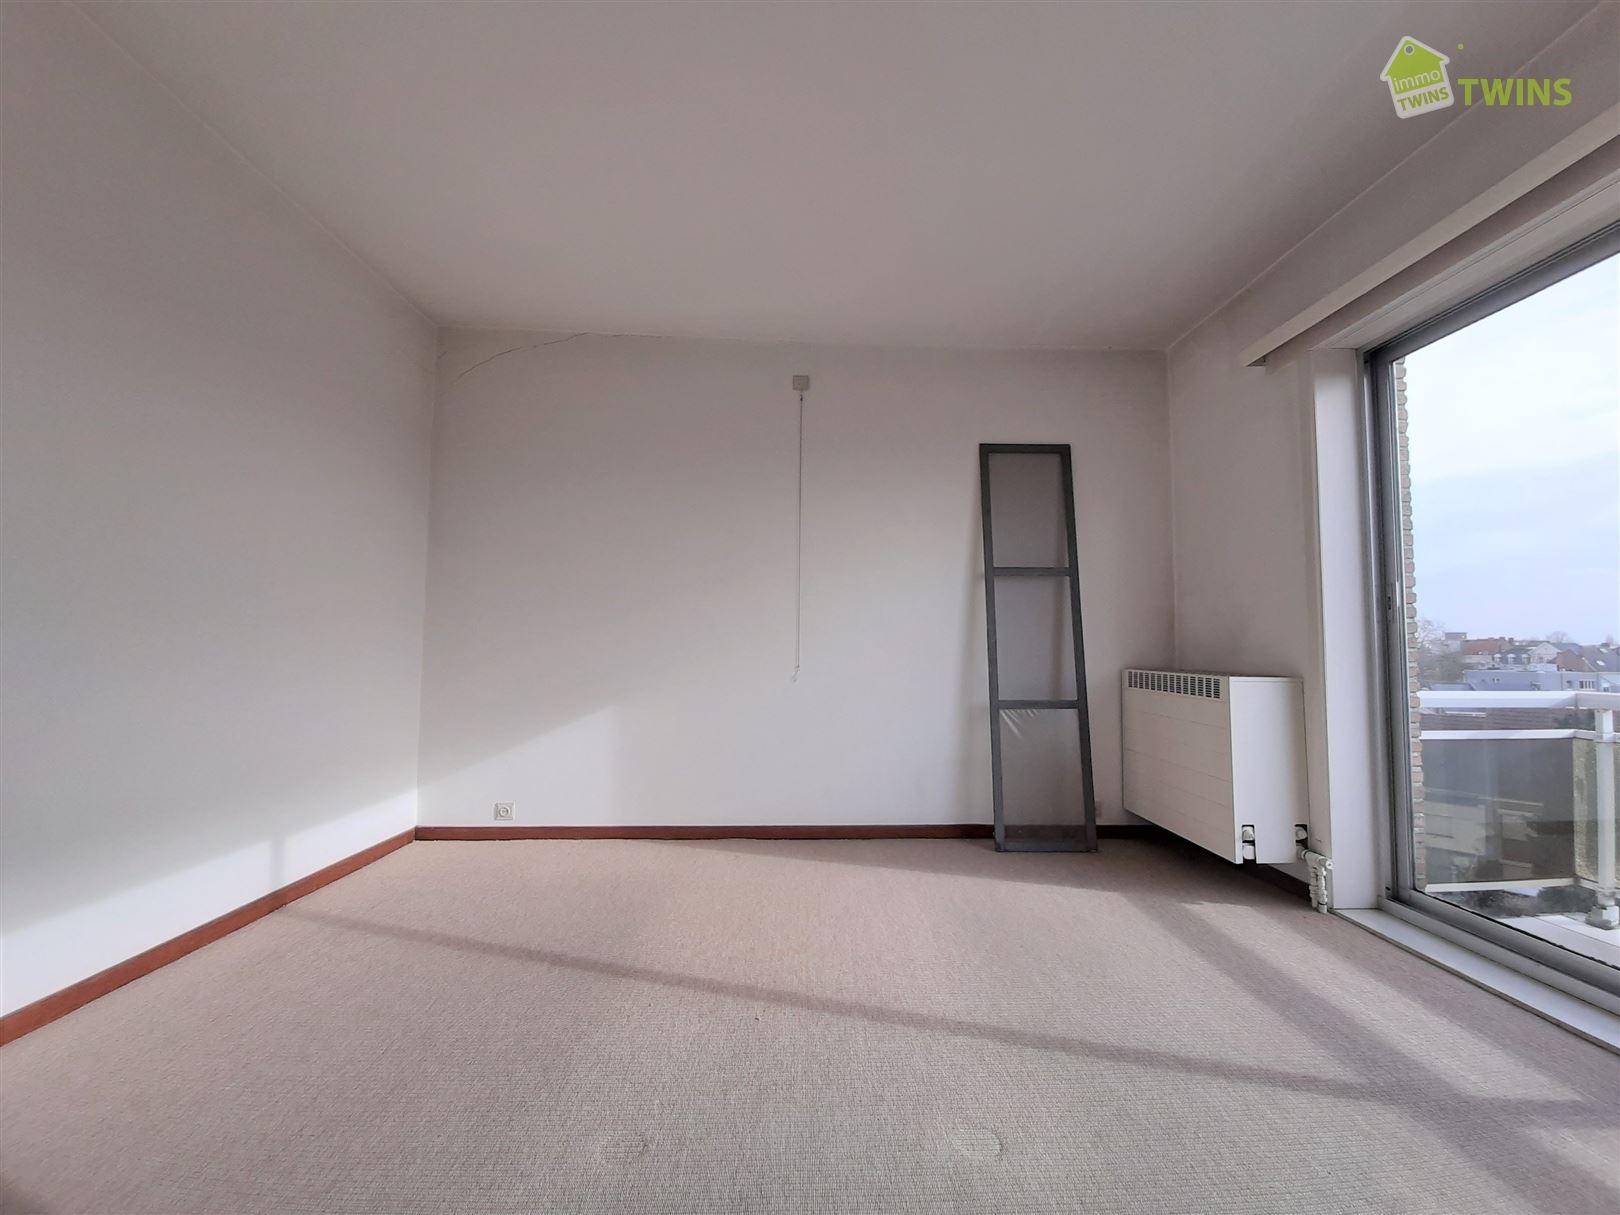 Foto 4 : Appartement te 9200 DENDERMONDE (België) - Prijs € 600